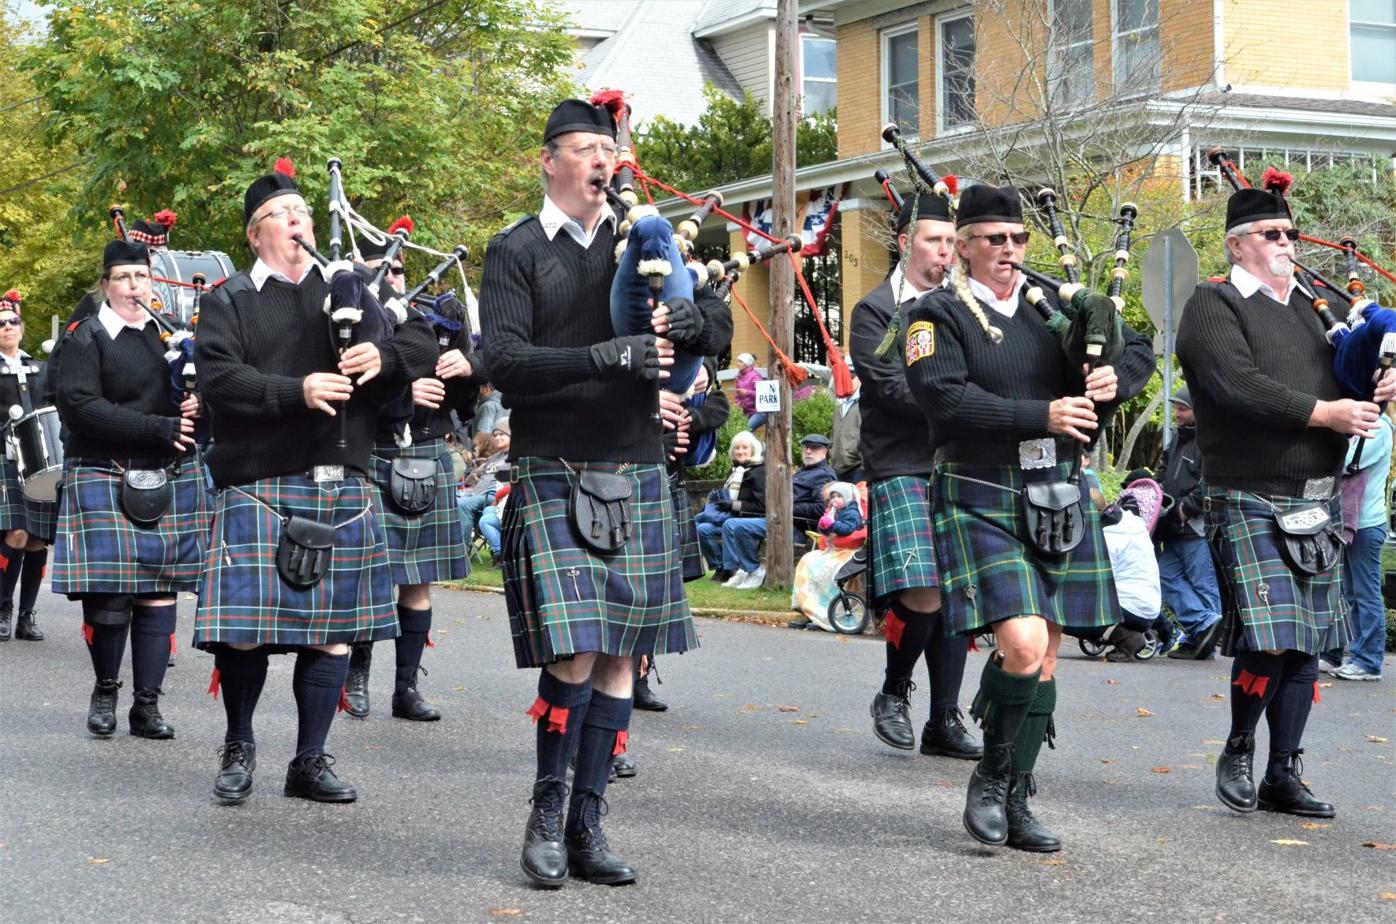 Highland glory